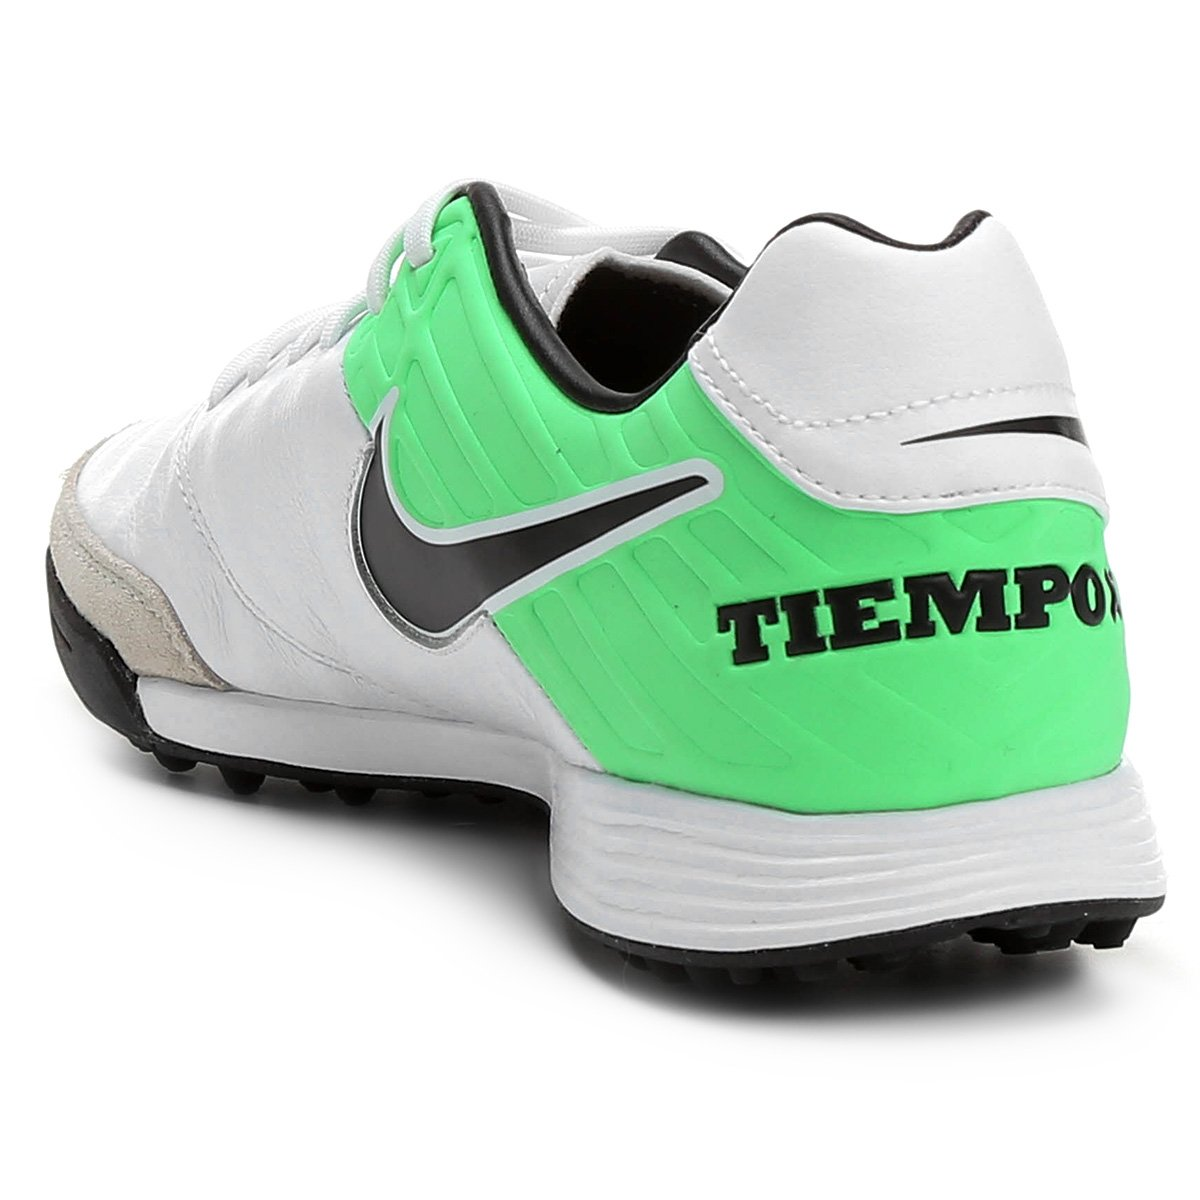 TF 5 Society Mystic e Tiempo Branco Nike Masculina Verde Chuteira dwIvqxXtq